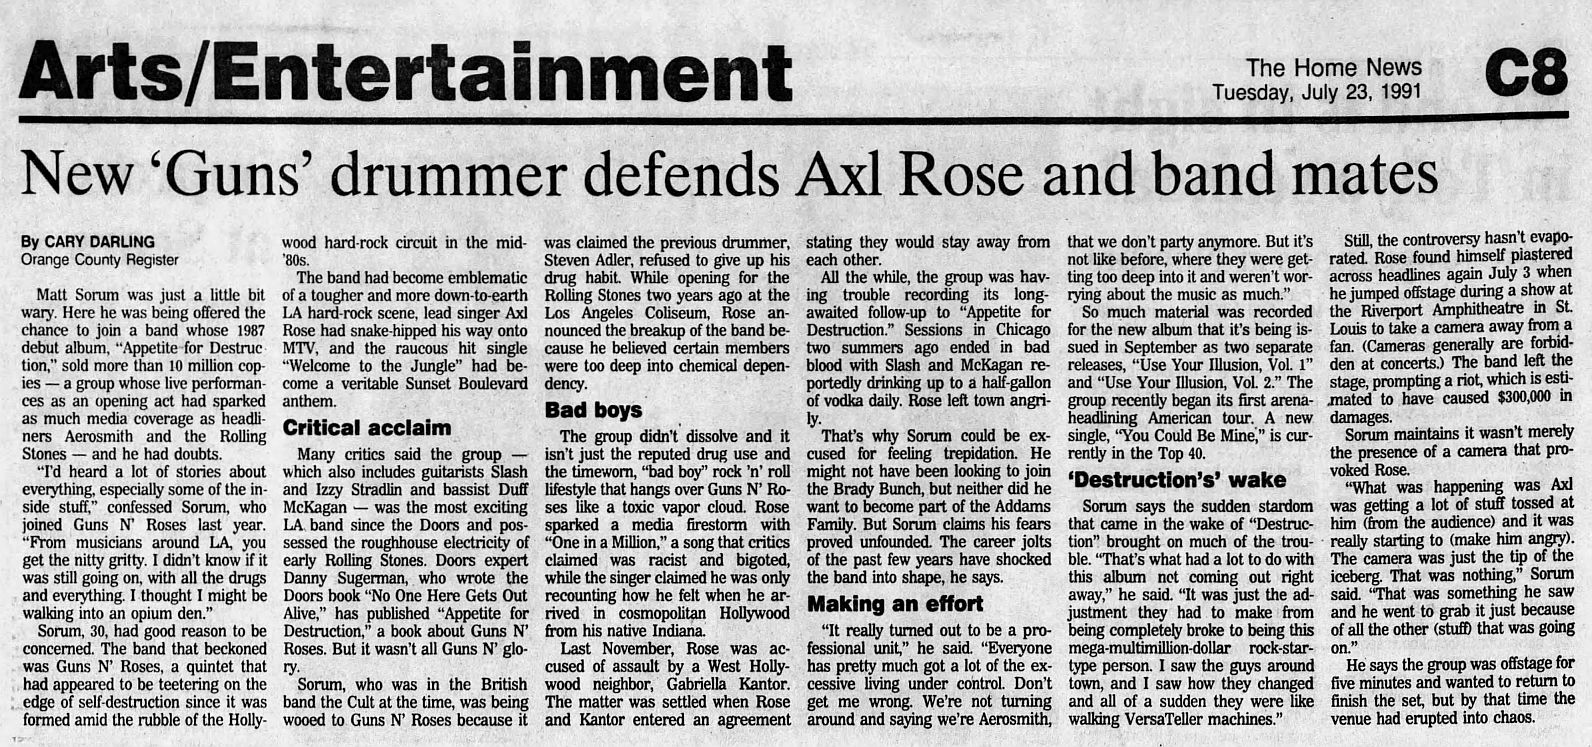 1991.07.23 - The Home News/Orange County Register - New 'Guns' Drummer Defends Axl Rose (Matt) 1YIPFWPF_o